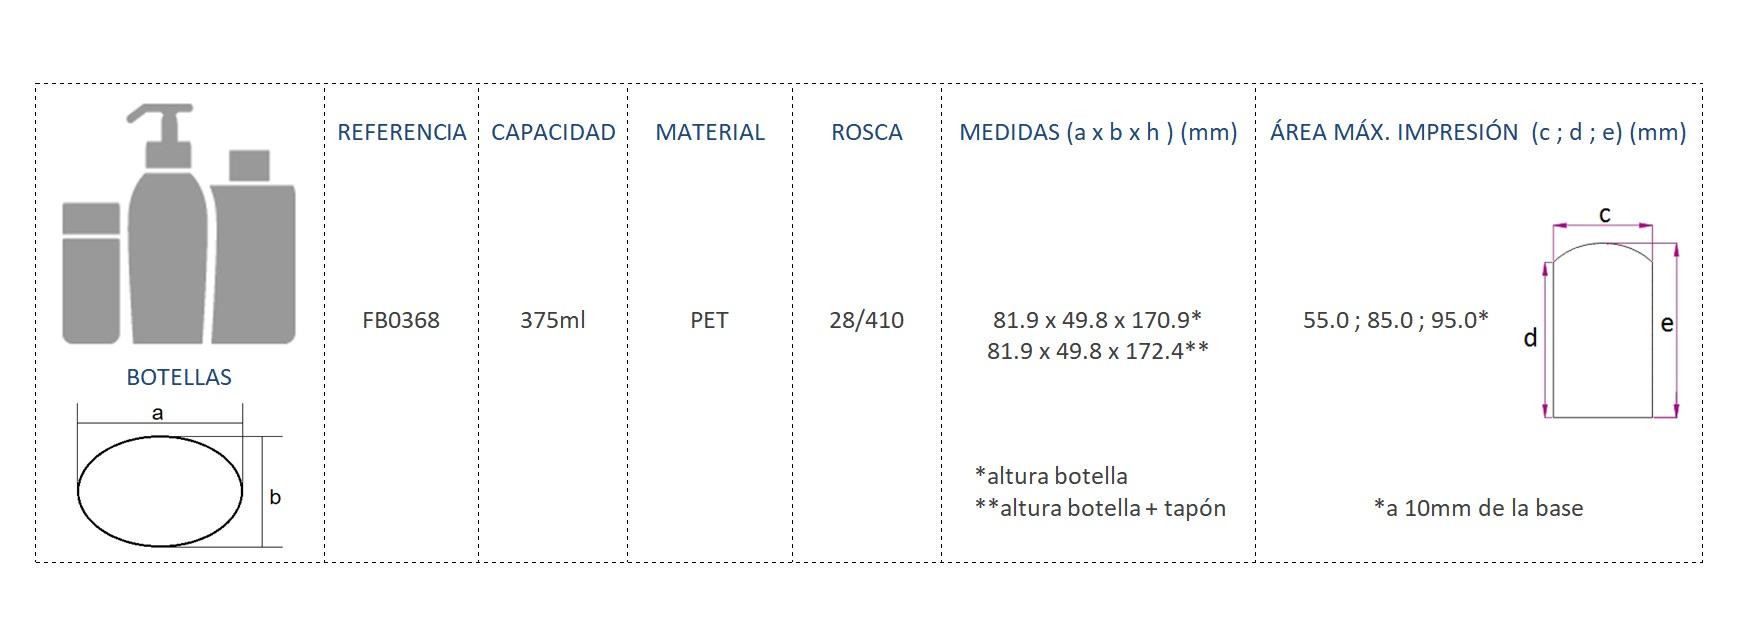 Cuadro de materiales botella FB0368